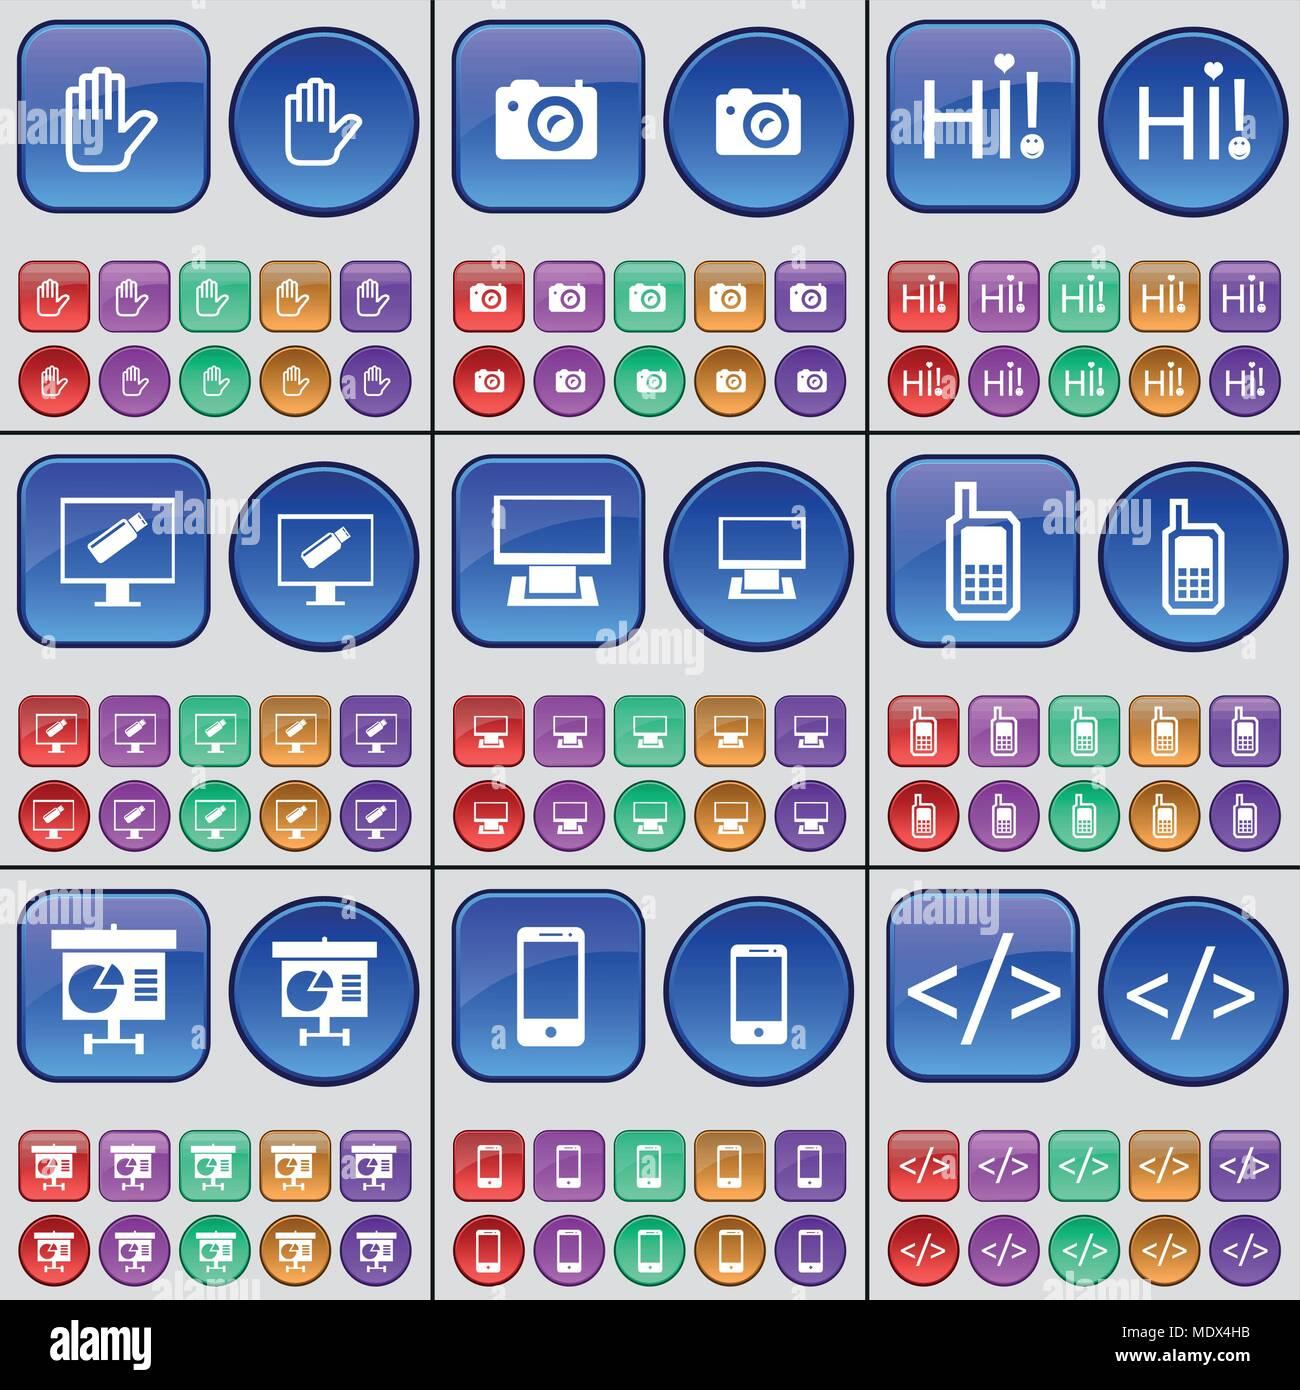 Phone Buttons Stockfotos & Phone Buttons Bilder - Seite 18 - Alamy